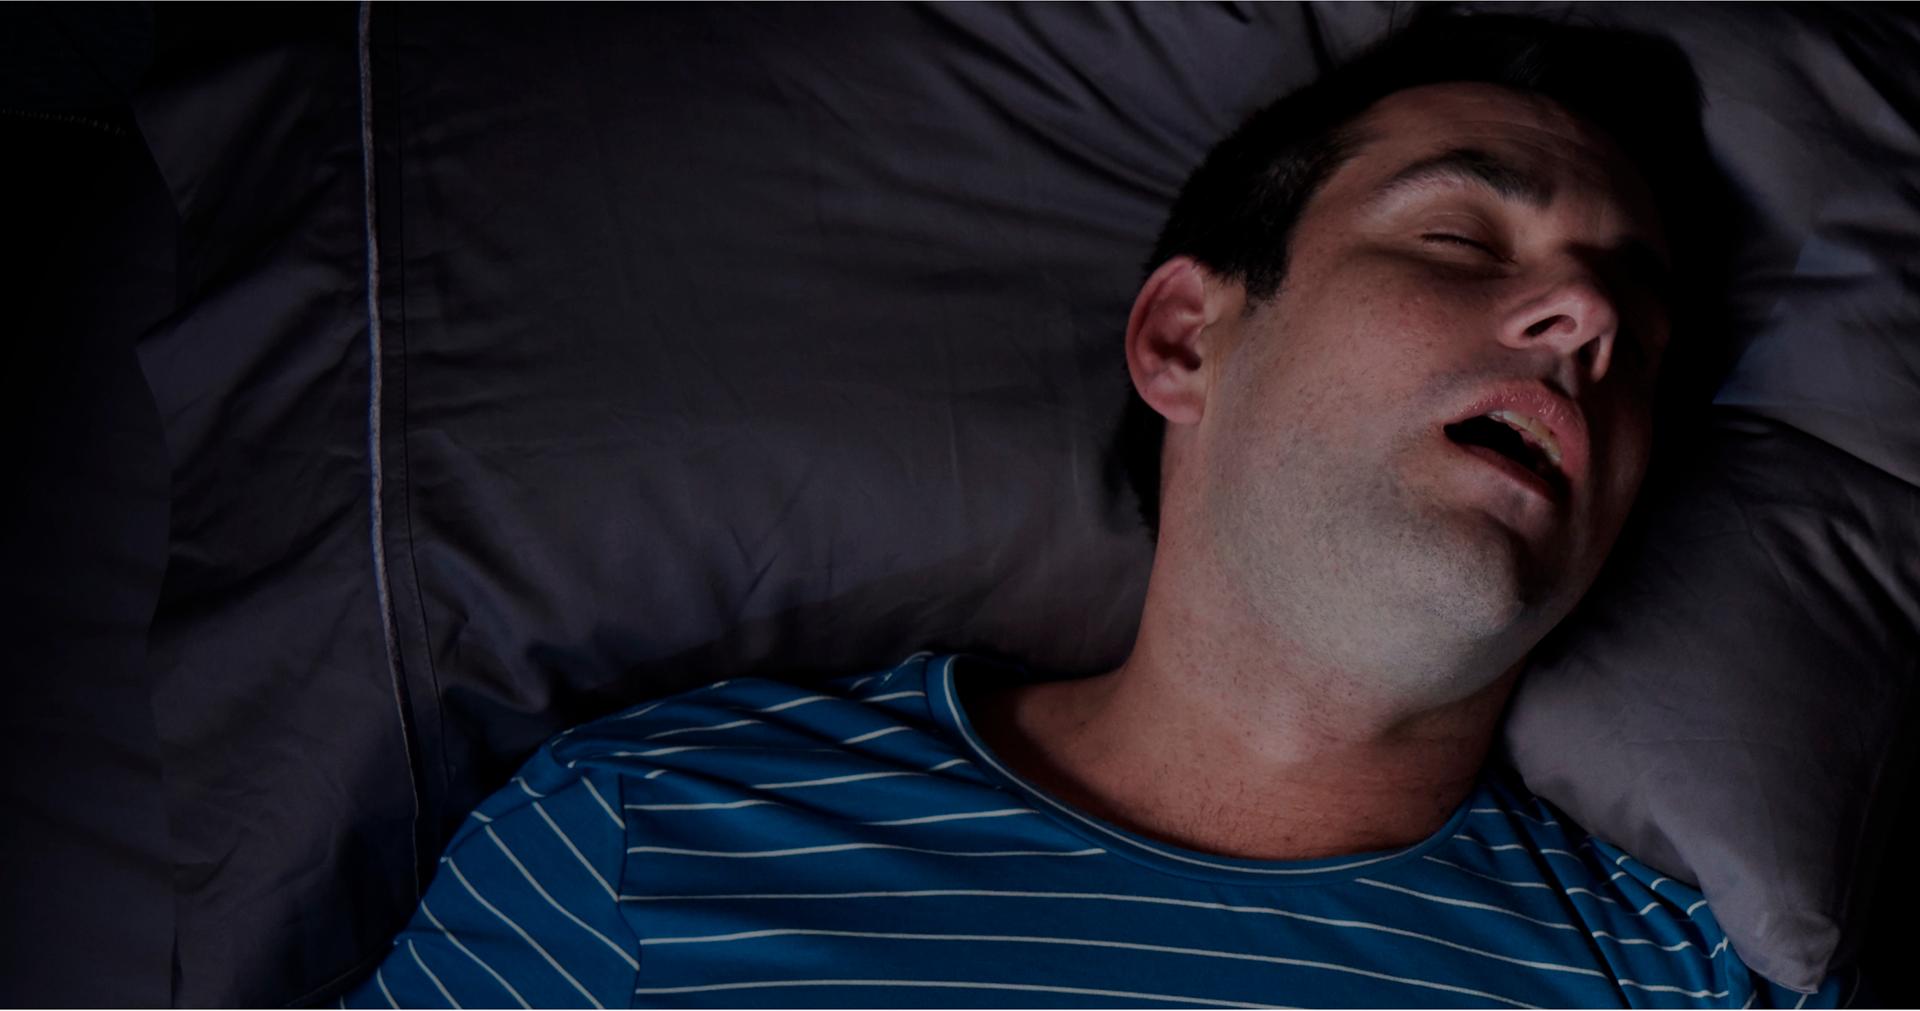 bg-homem-dormindo-2